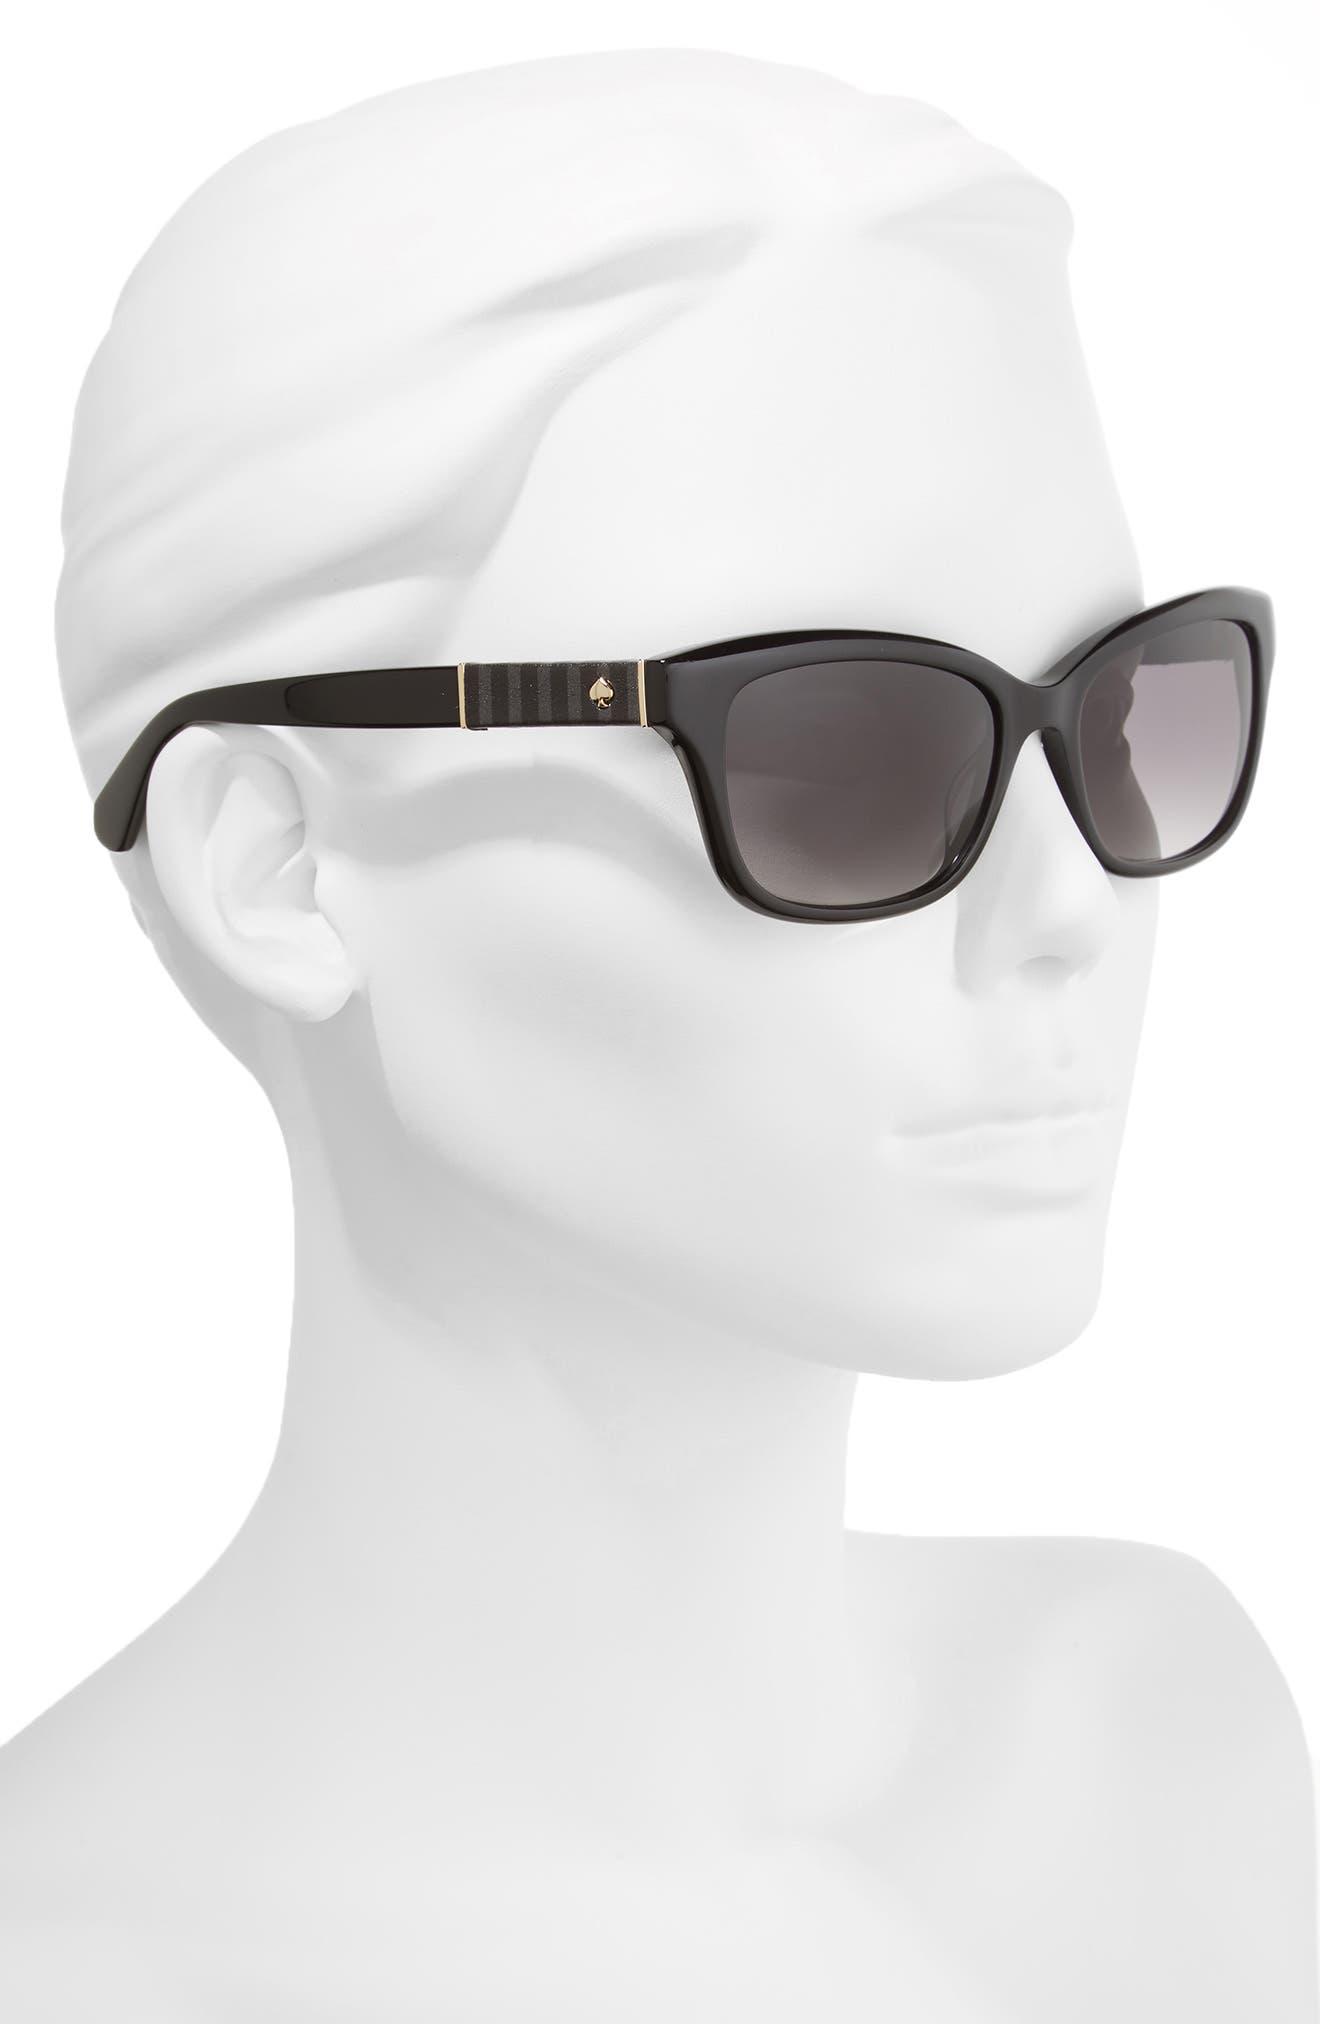 johanna 2 53mm gradient sunglasses,                             Alternate thumbnail 2, color,                             001